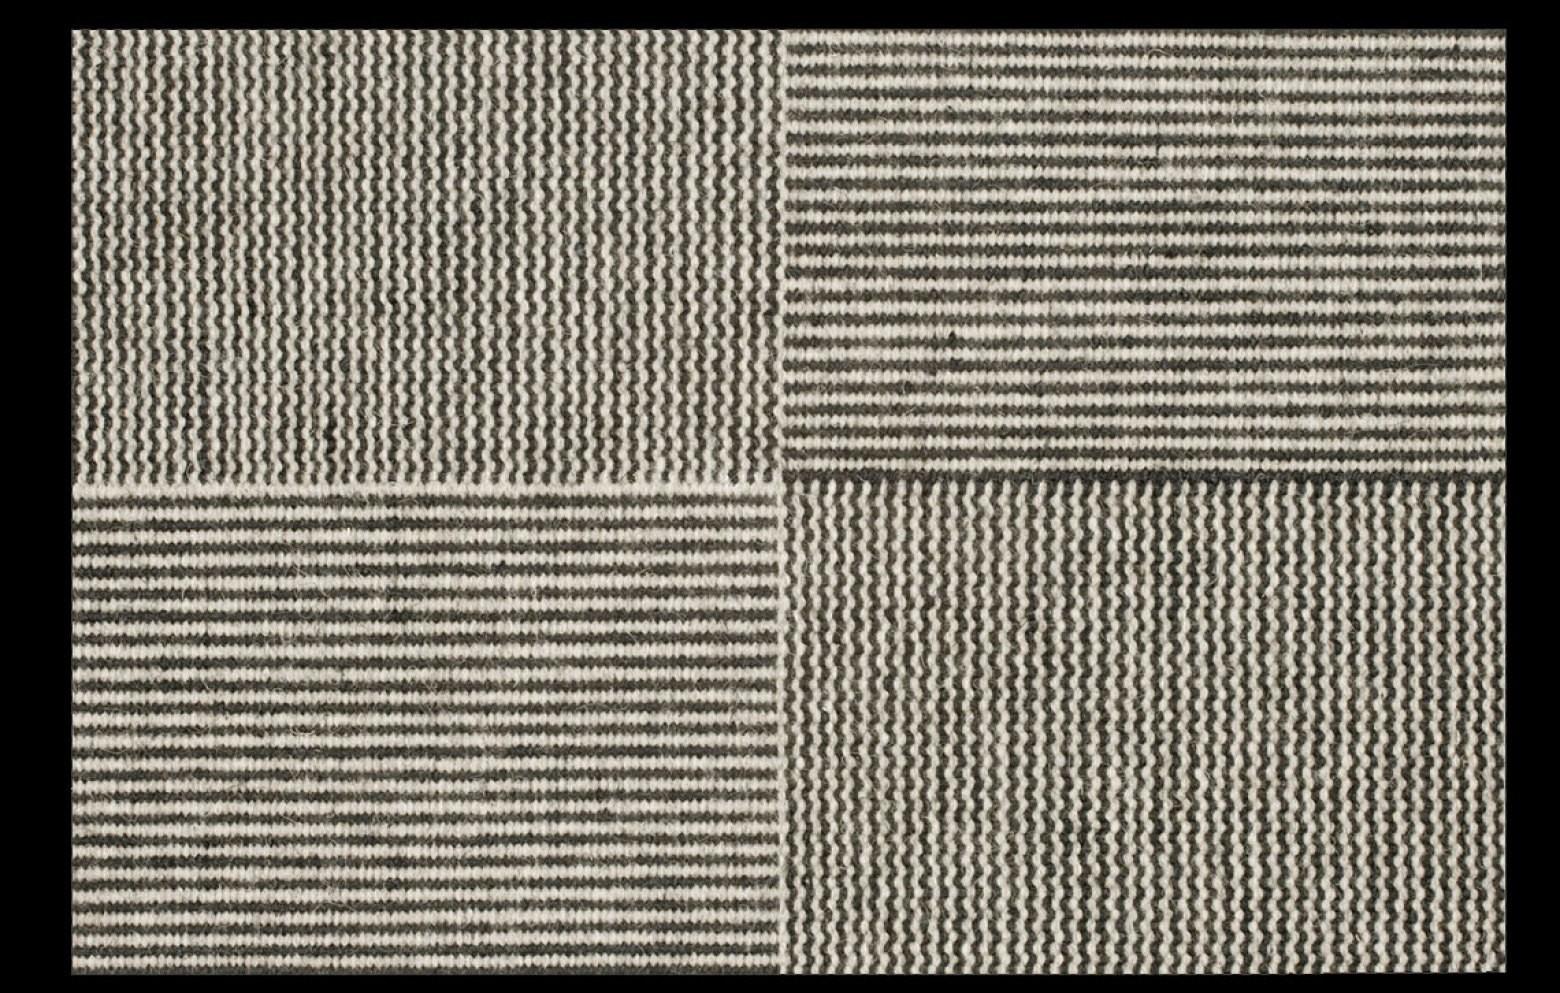 KENT  Teppiche  Kleinmöbel & Accessoires  Whos perfect